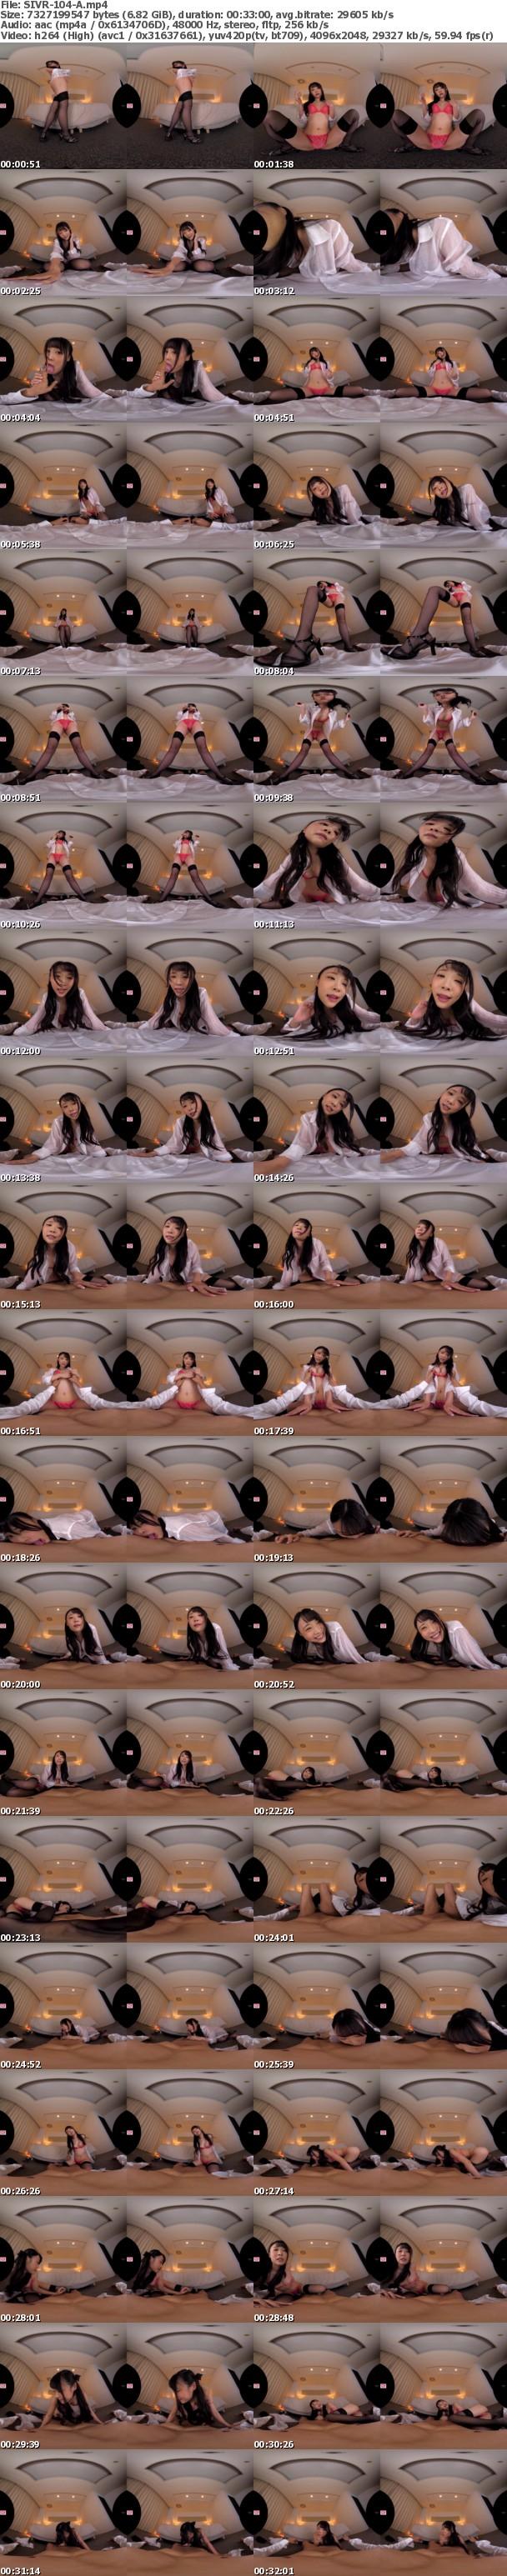 (VR) SIVR-104 吉岡ひよりに常に見下し視線で連続7射精されちゃう怒涛の淫語・ベロキス・顔面舐め回し絶倫痴女VR